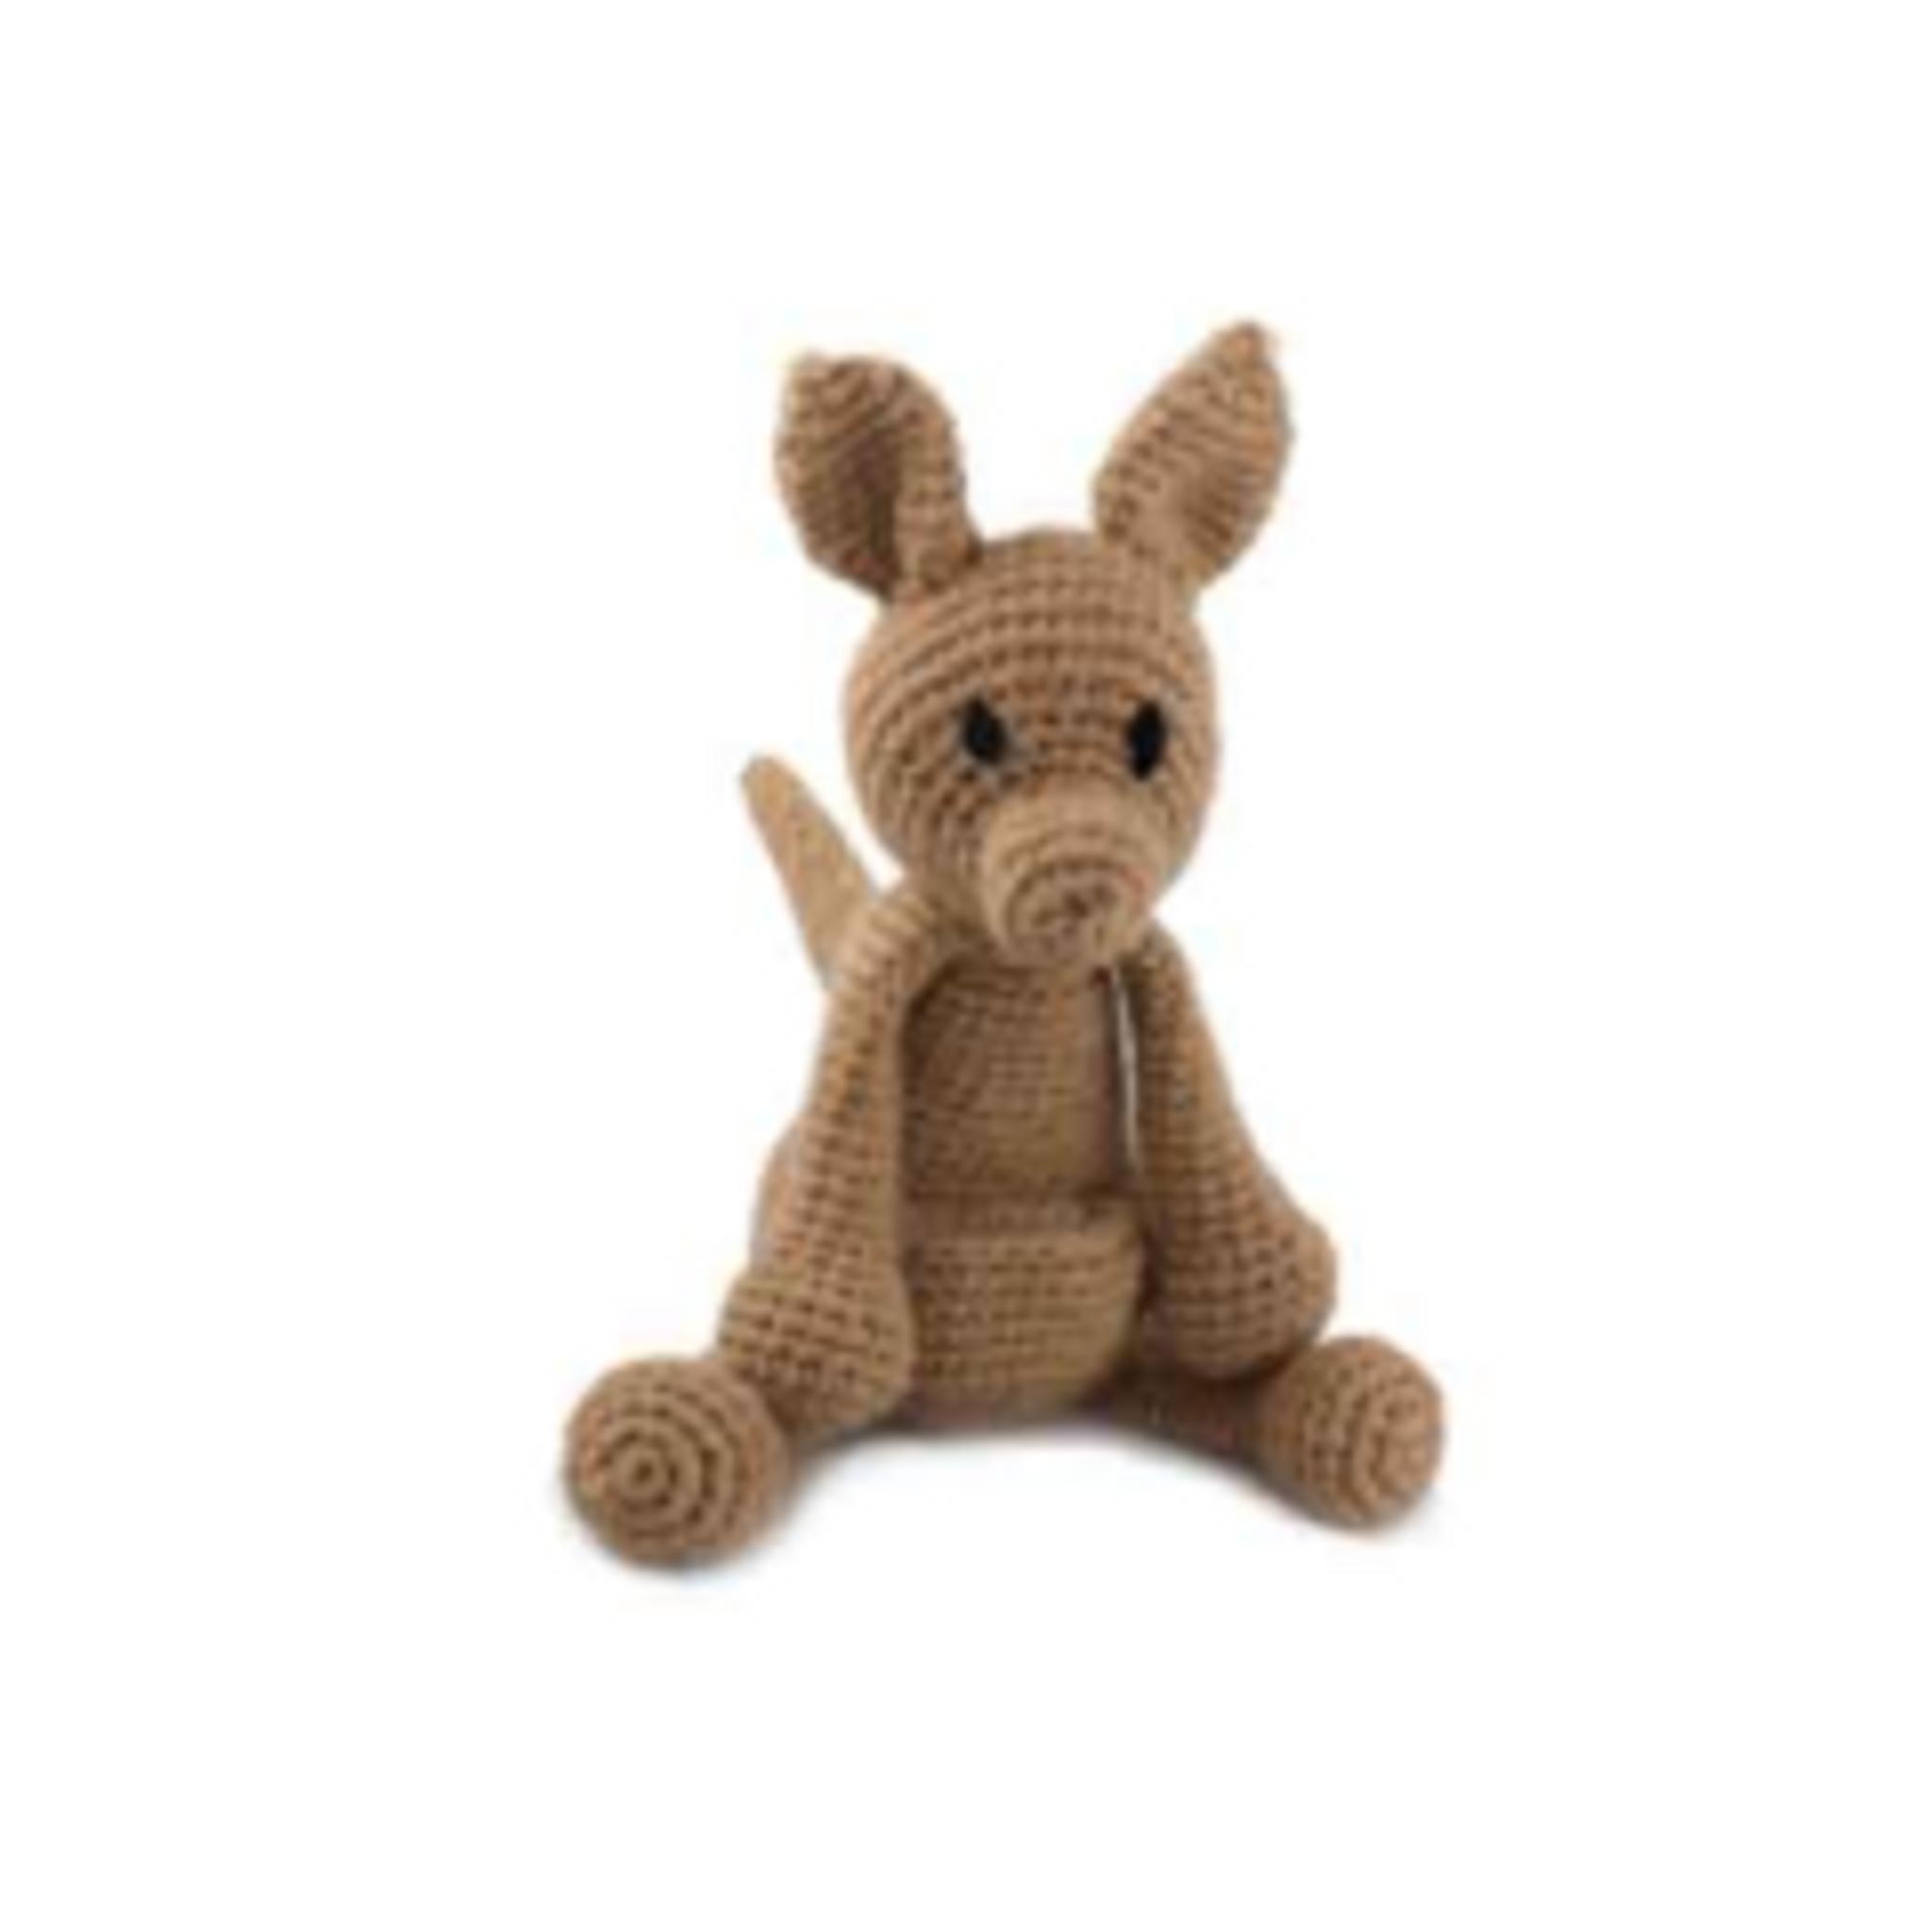 Easy Crochet Kits for Beginners | Darn Good Yarn | 2048x2048